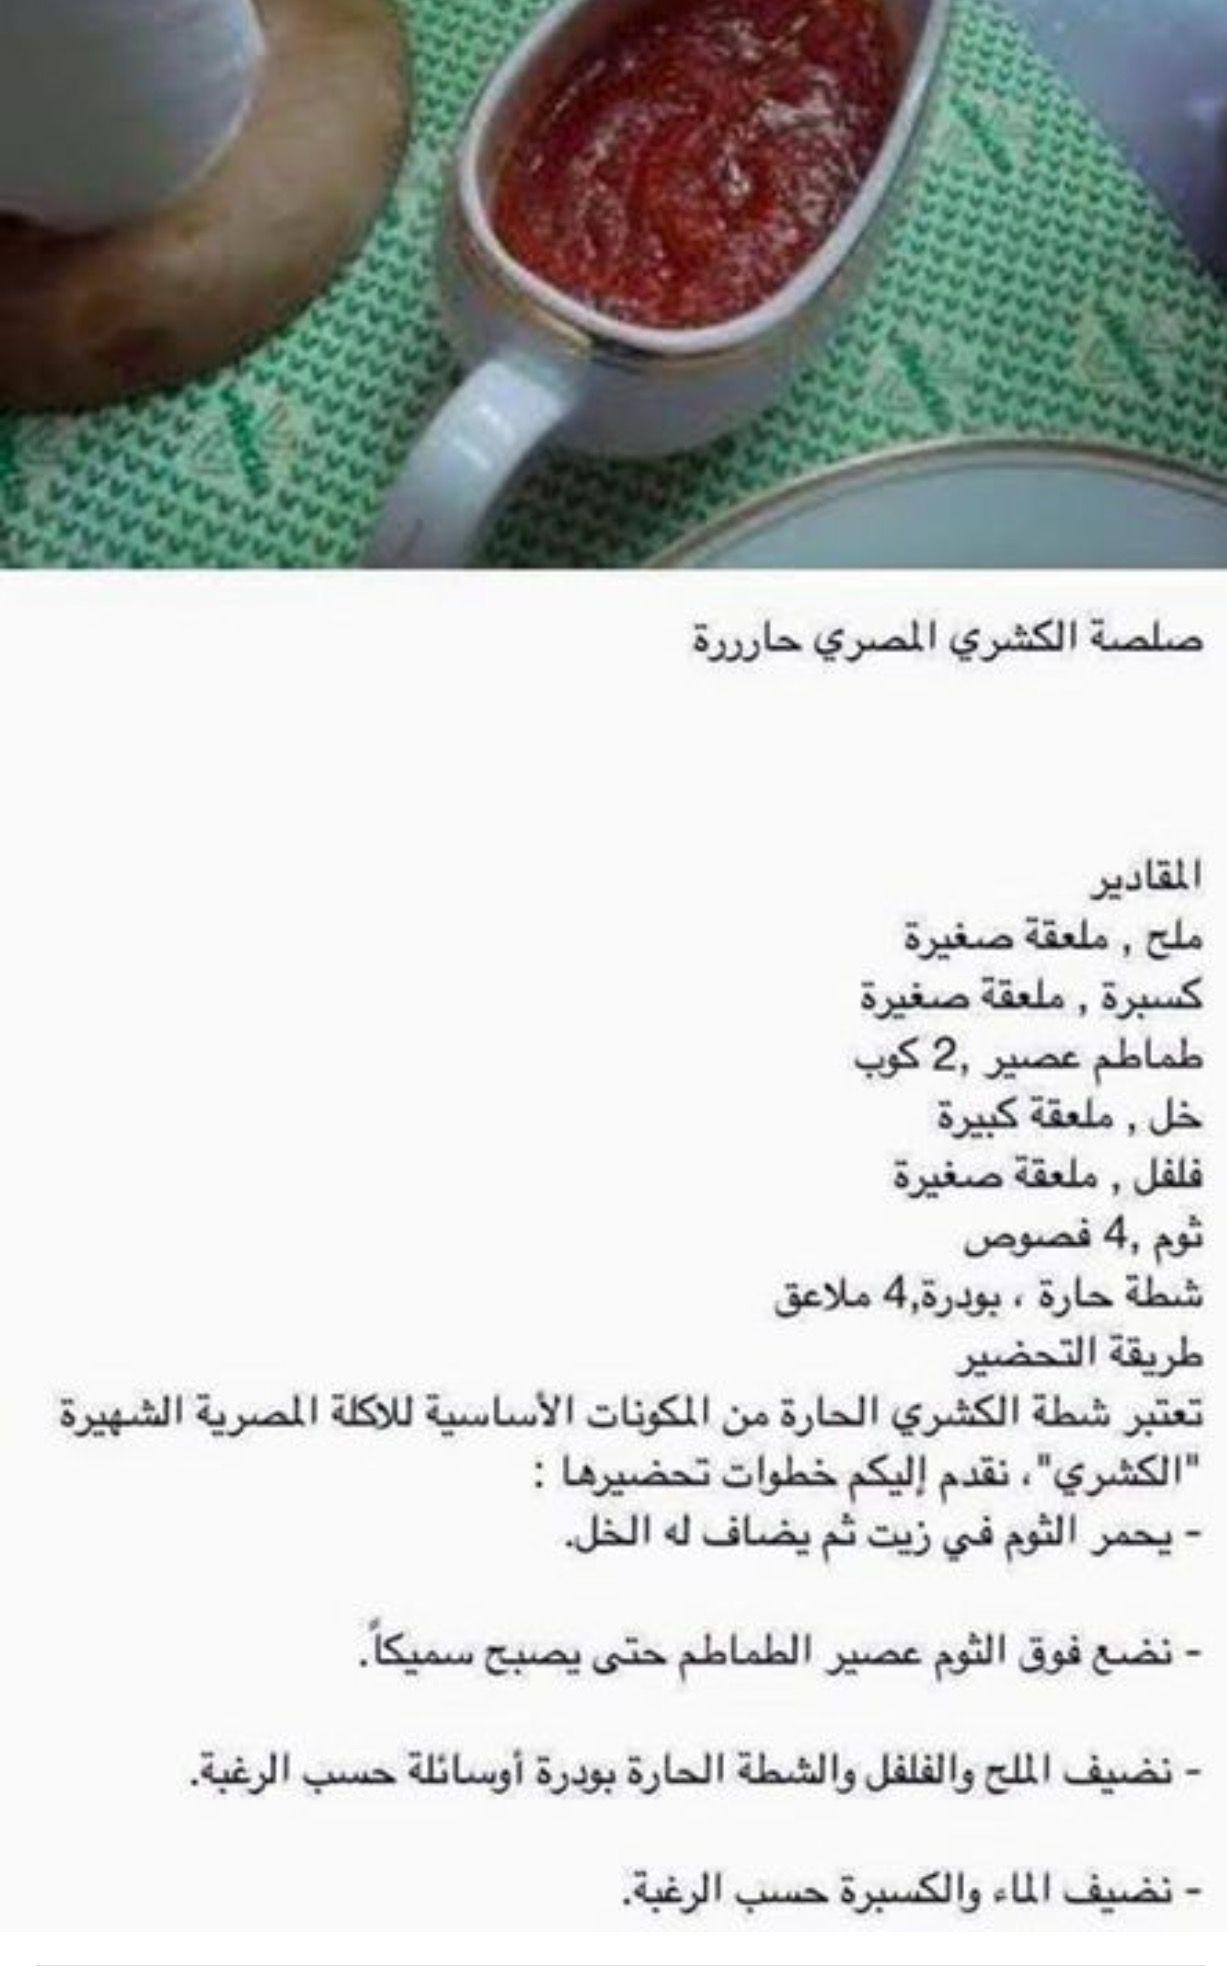 صلصة الكشري المصري Egyptian Food Food Receipes Arabic Food